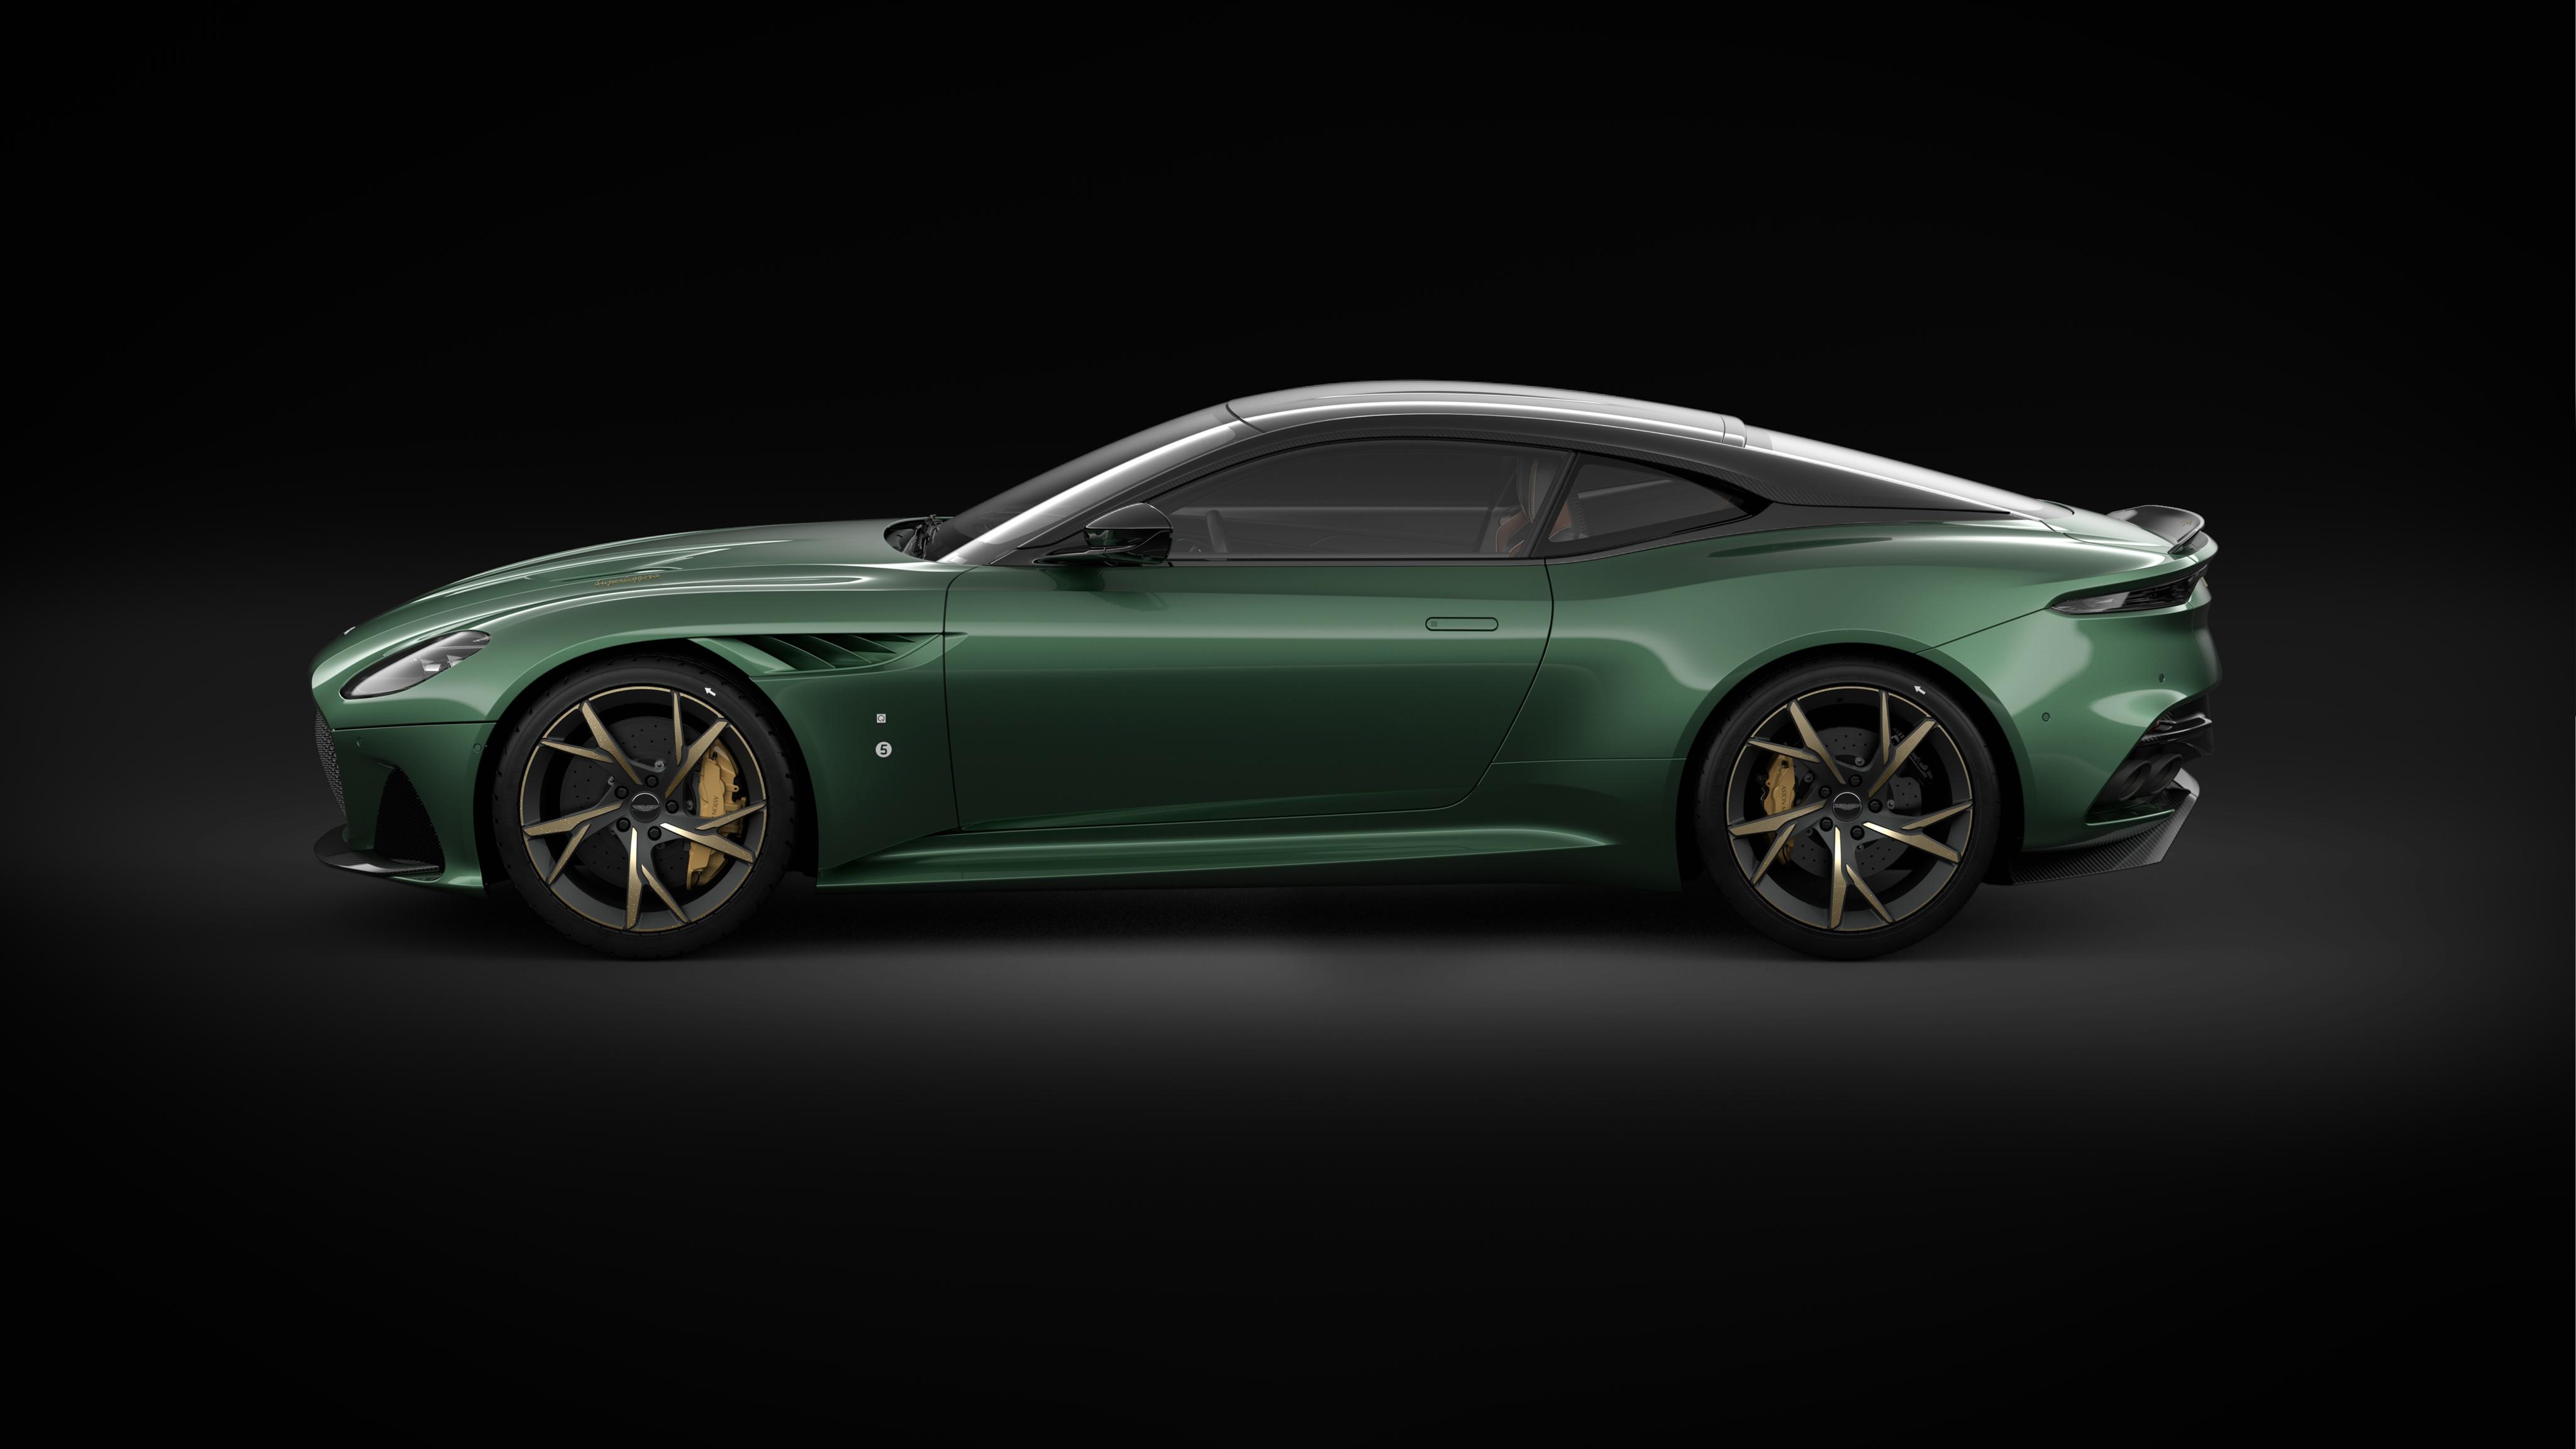 Turns Out The New Aston Martin Vantage Looks Good In Black Or White Too 338 Pics Autos Deportivos Autos Deportes